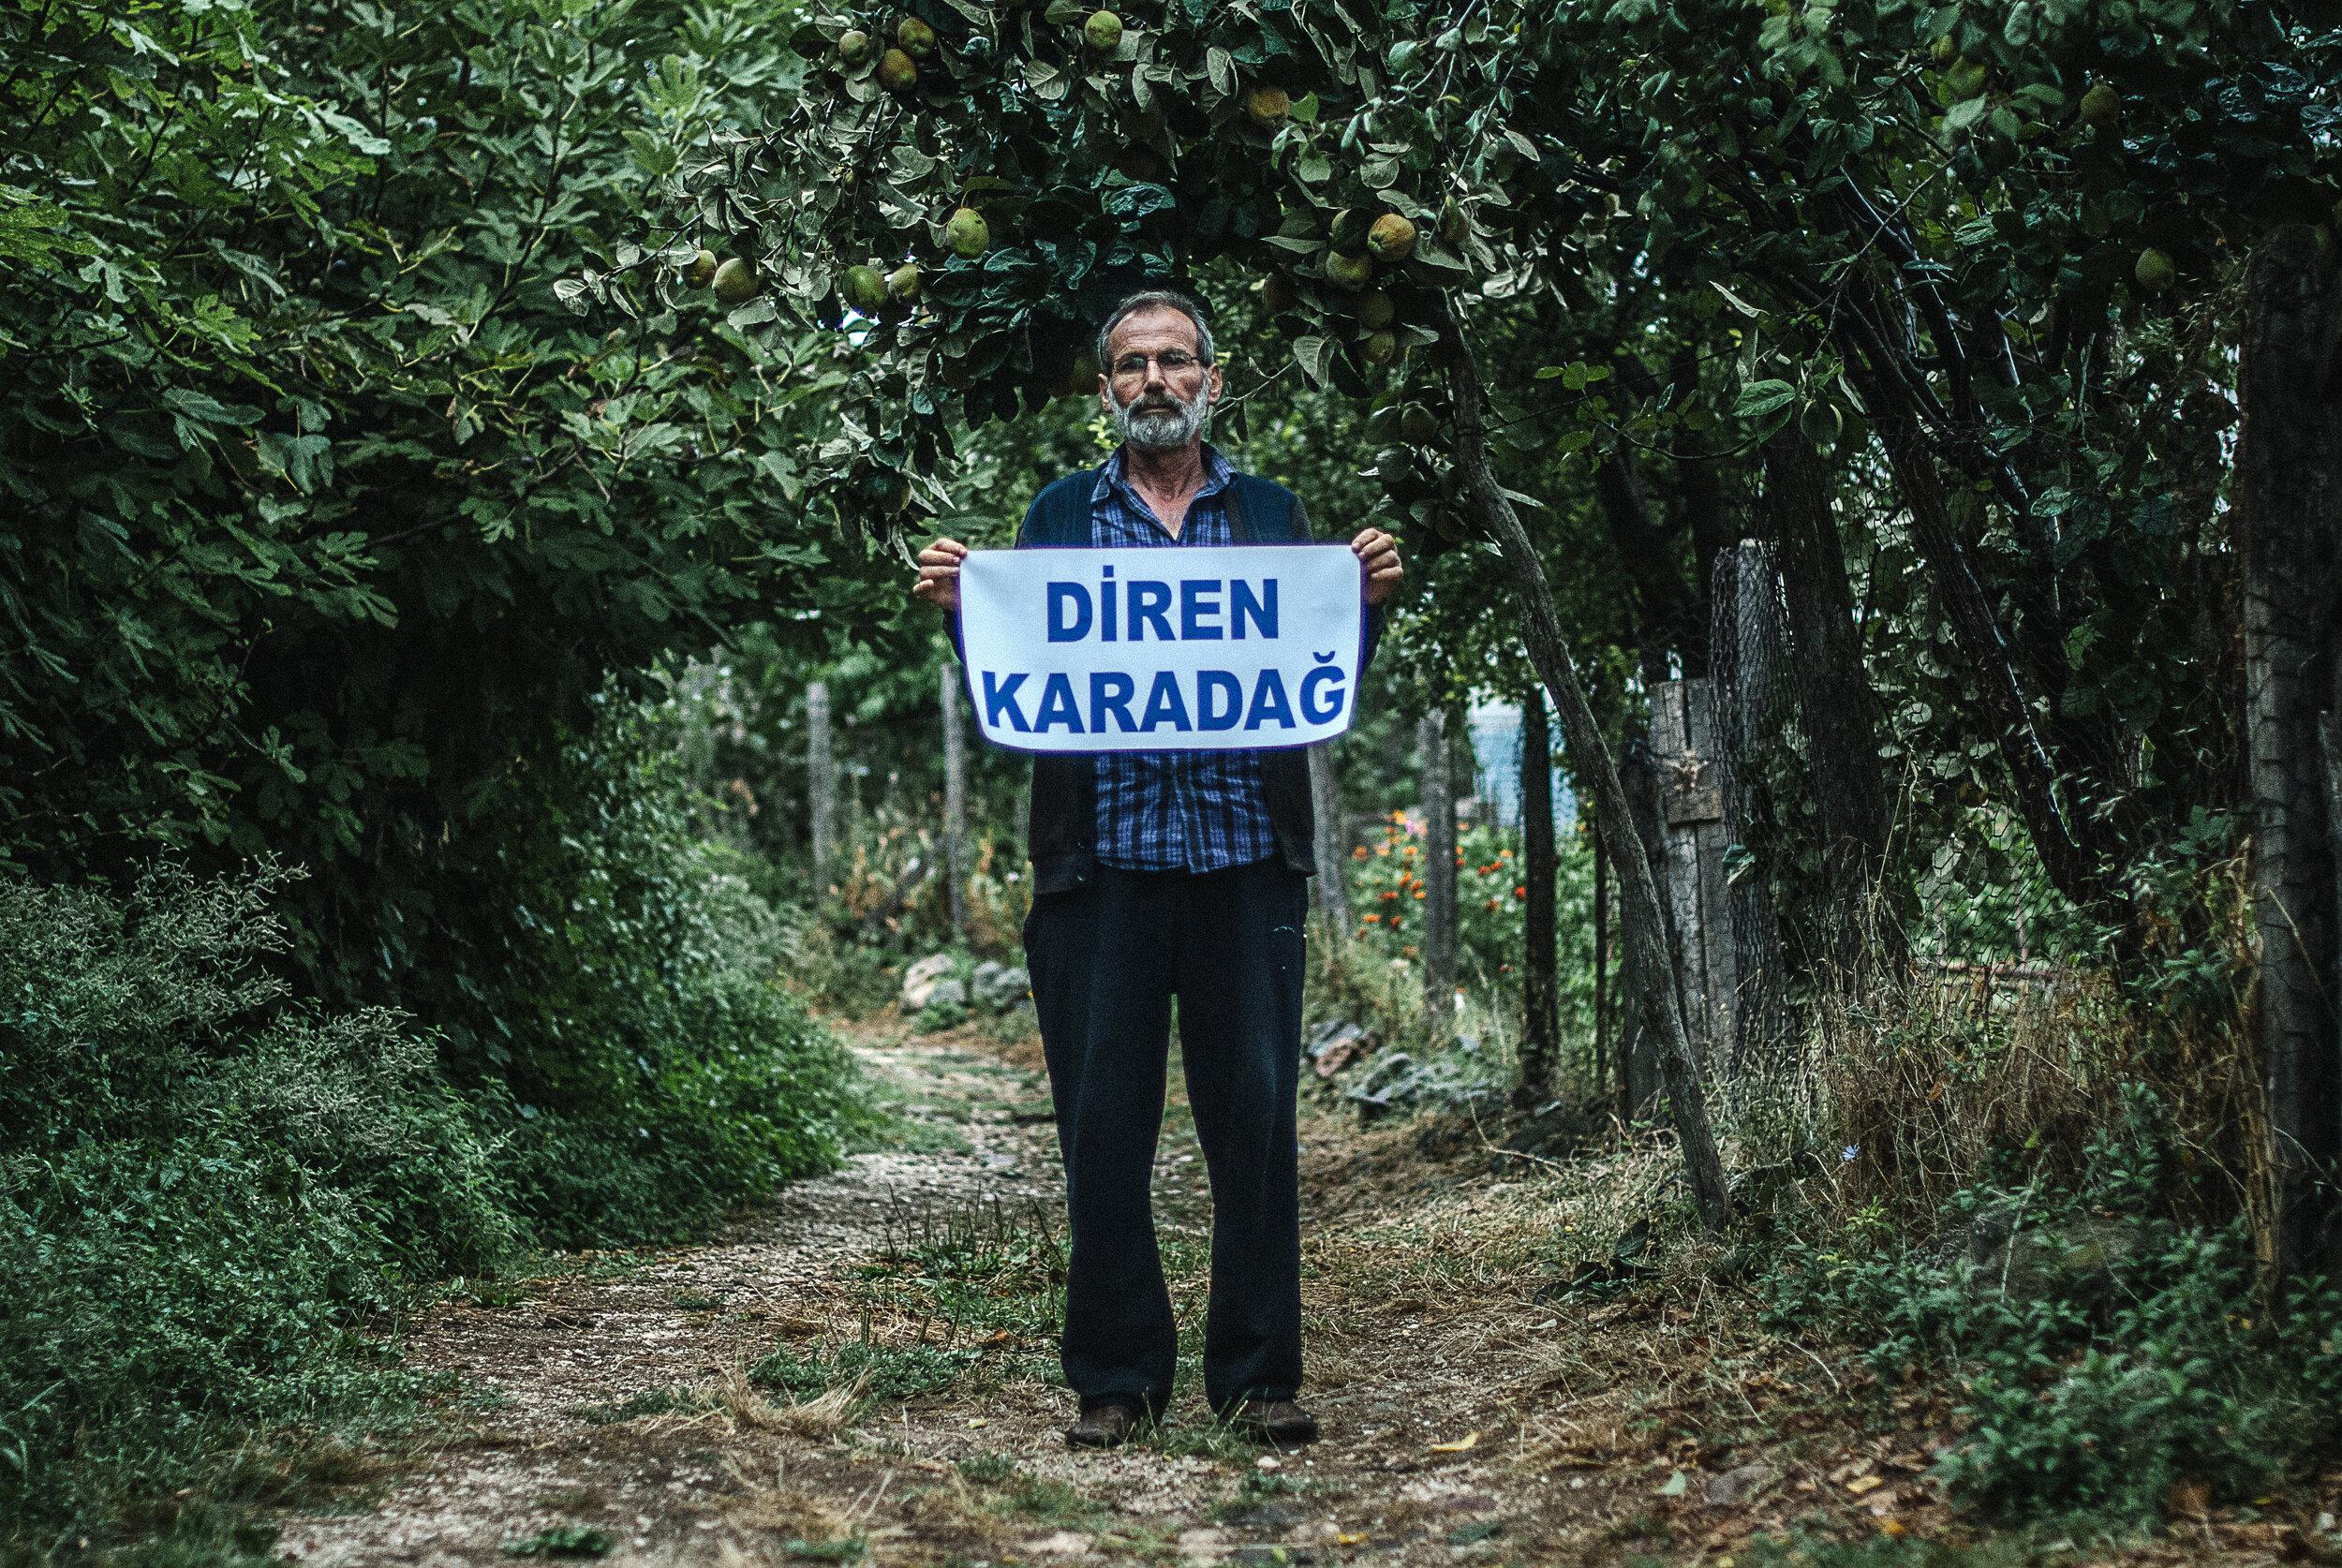 Views from protests in 2014 against Eczacıbaşı's mining activities in southwest Marmara (1/4) (courtesy of Aykan Özener)